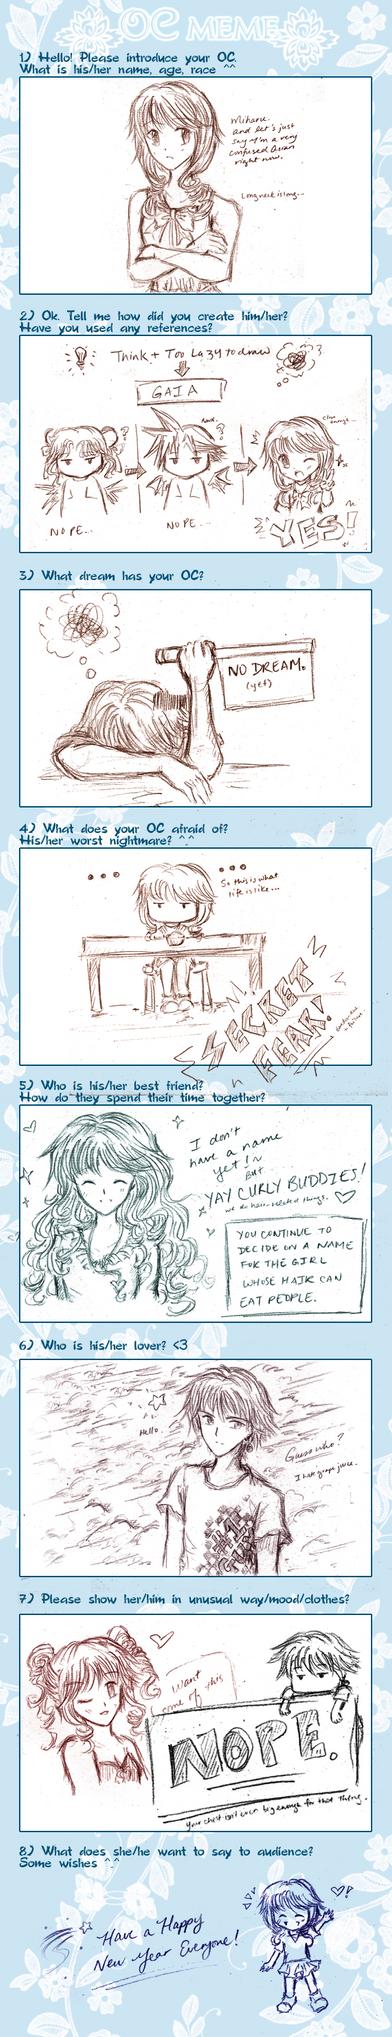 First Meme- OC Meme: Miharu by aragorn1014